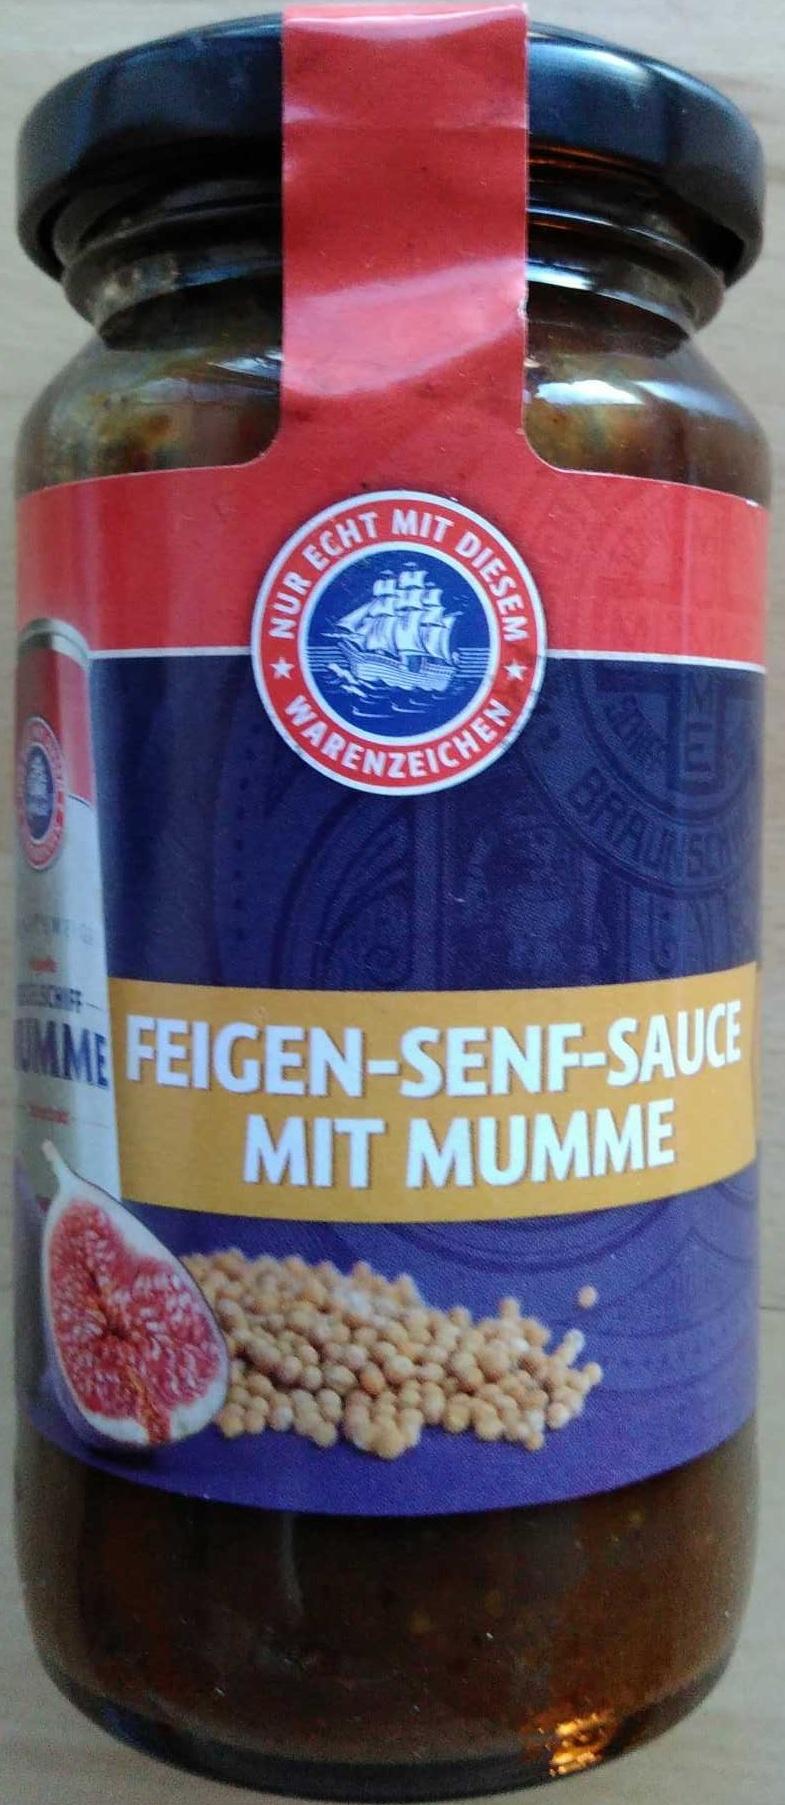 Feigen-Senf-Sauce mit Mumme - Product - de